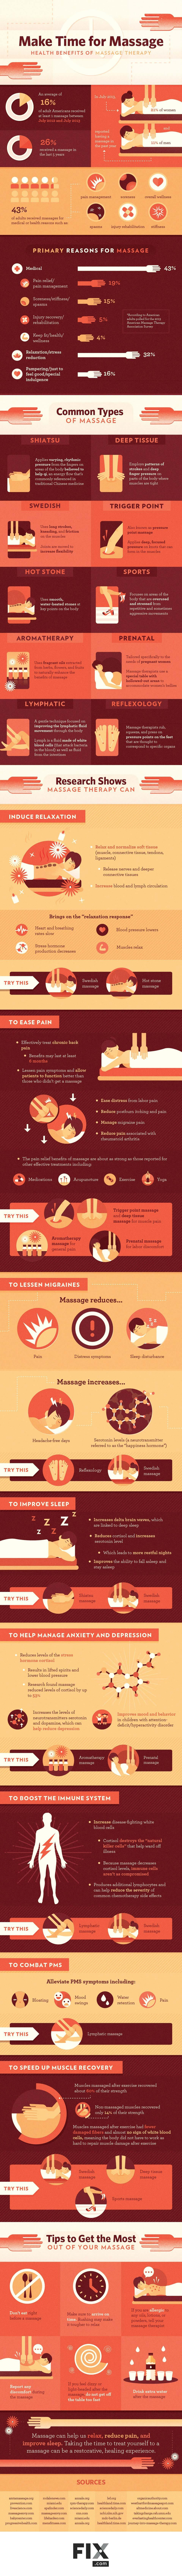 heatlh-professional-massage-benefits